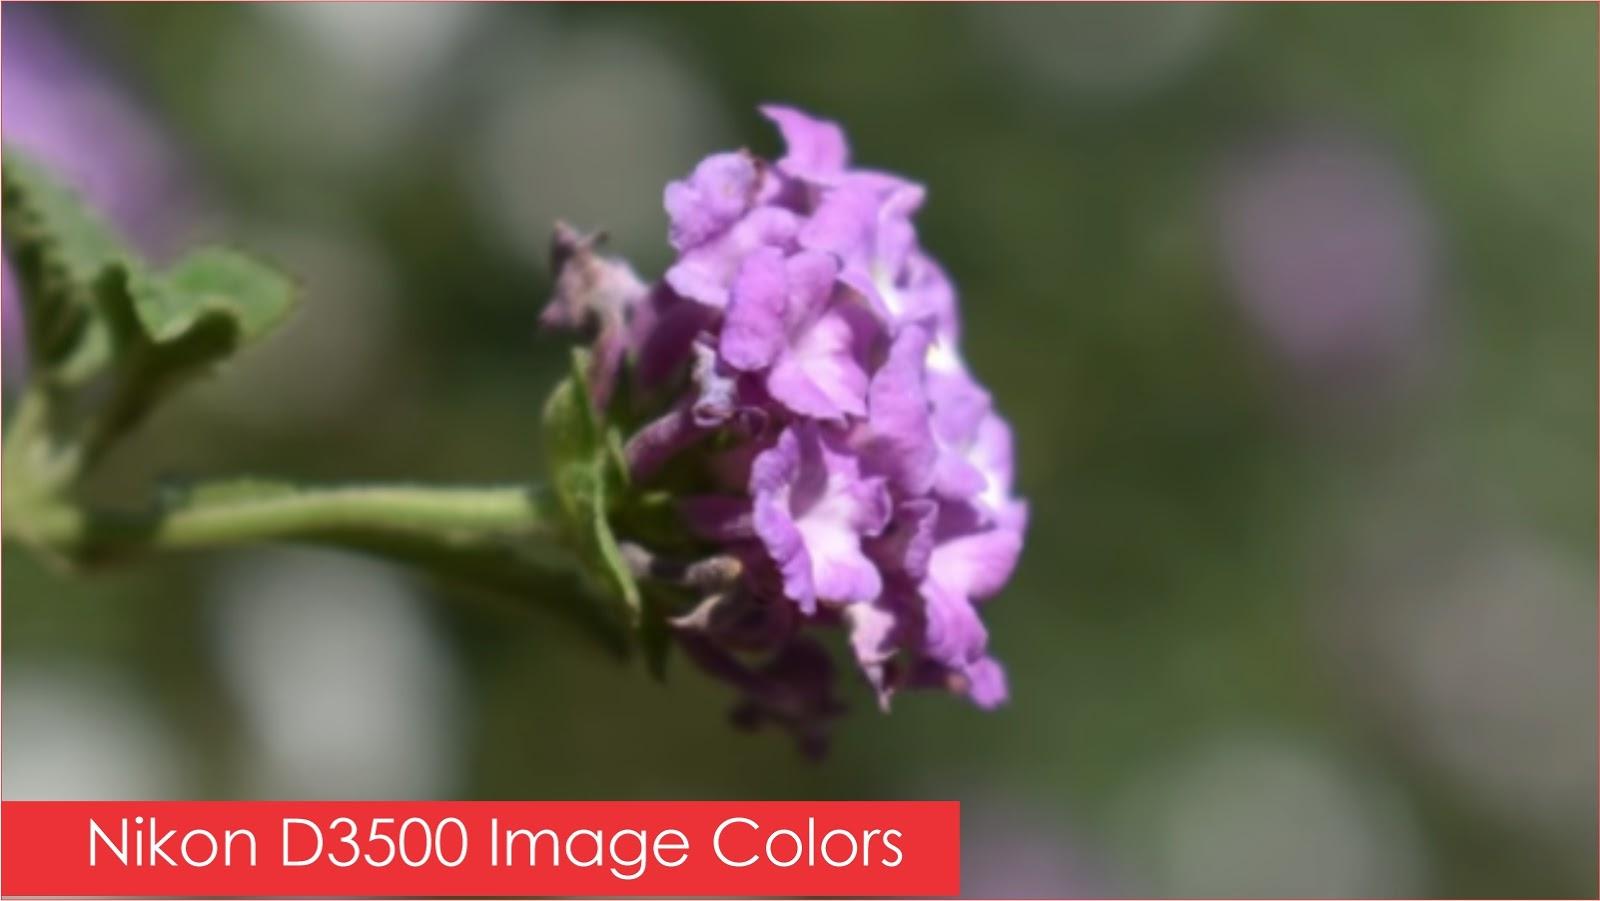 Nikon D3500 Camera Image Performance